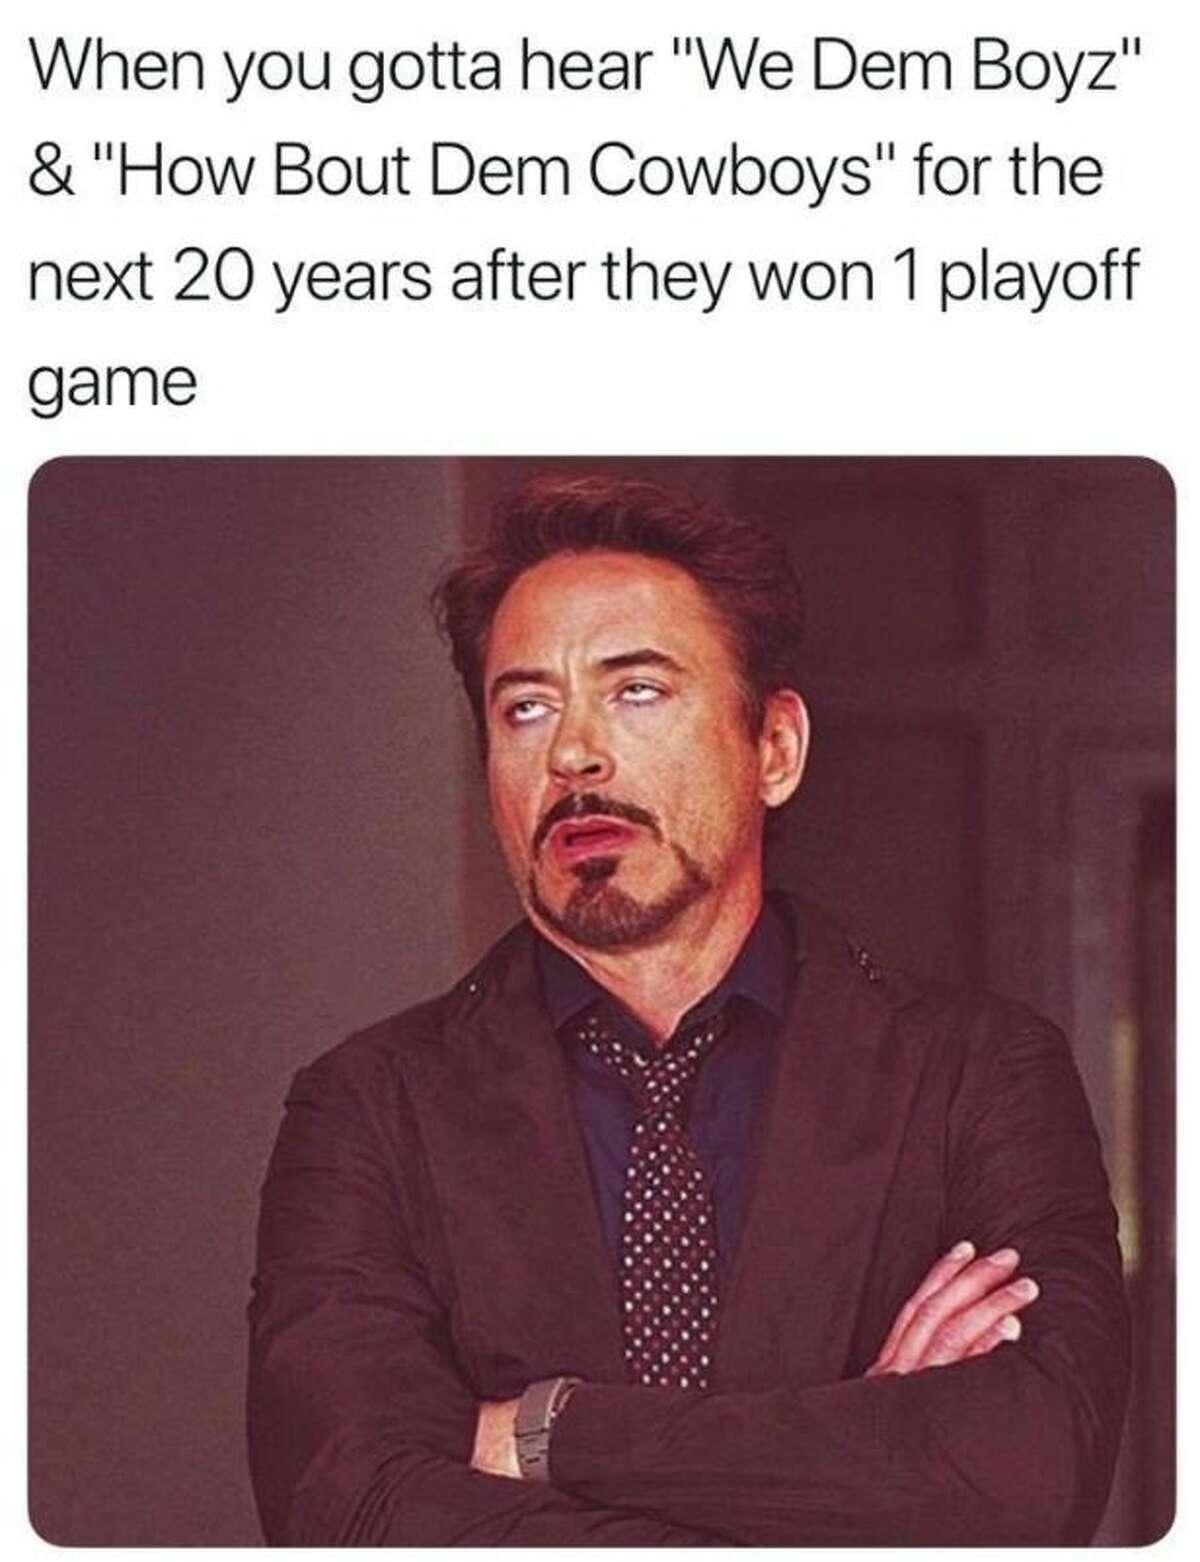 Source: Facebook.com/MEMES.of.the.NFL